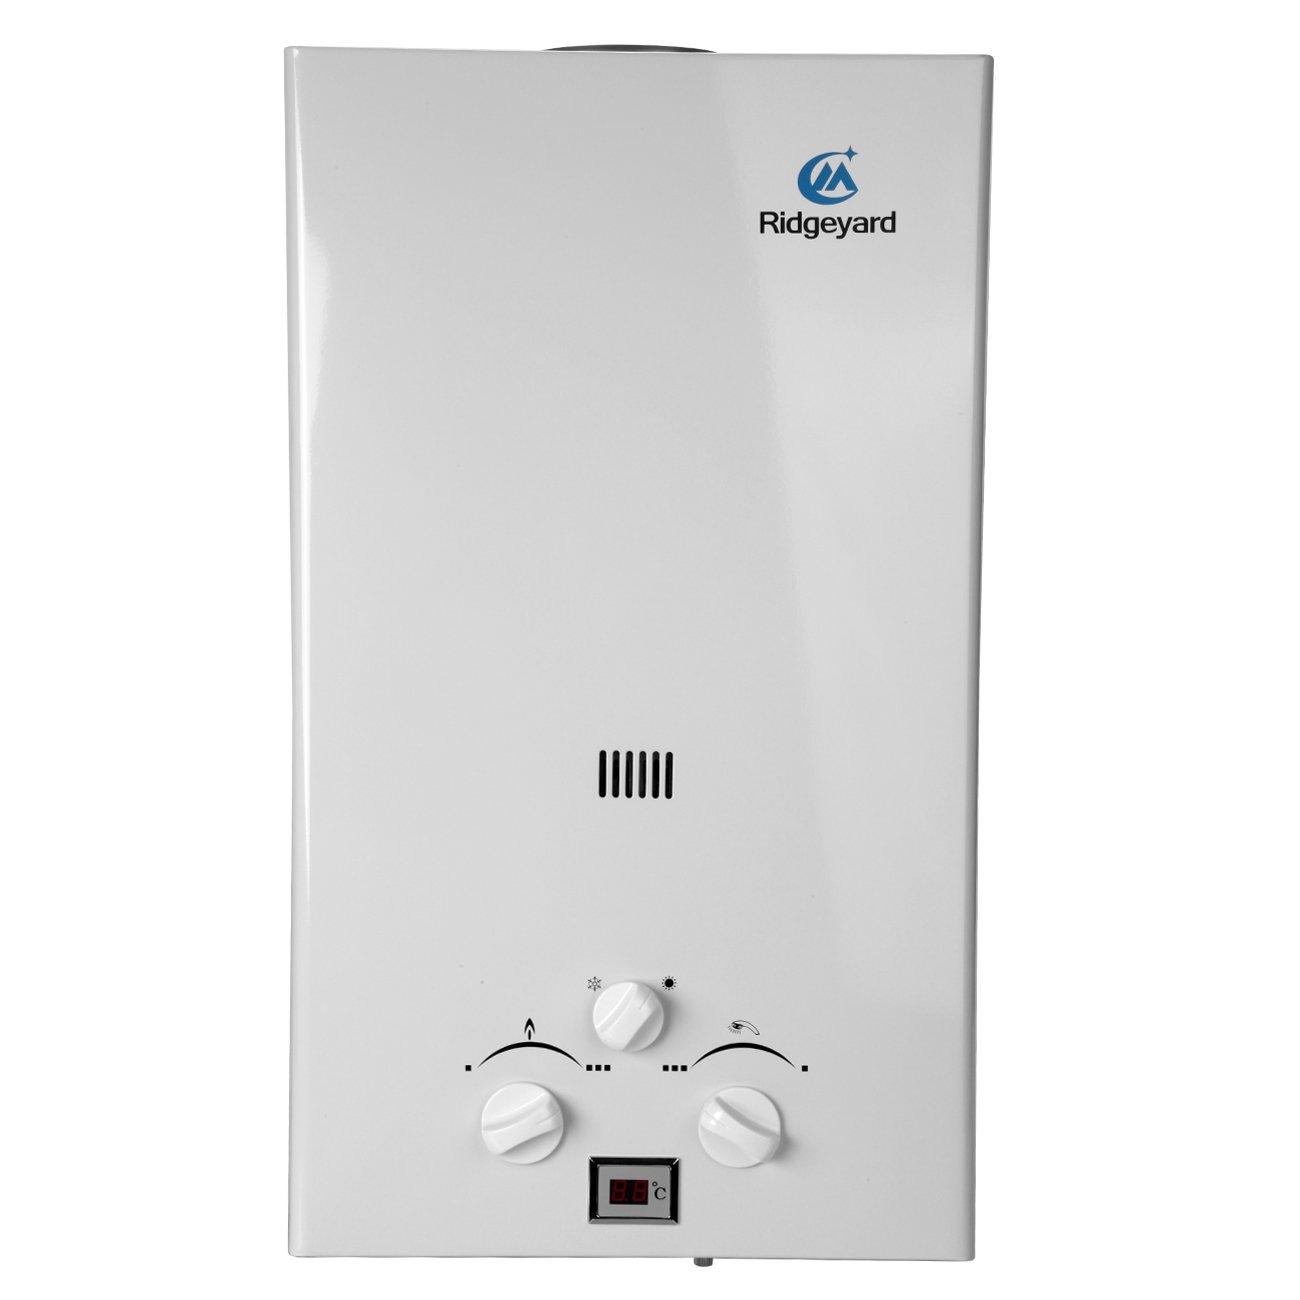 Ridgeyard 10L Propane Gas LPG Instant Hot Water Heater Tankless Boiler with Shower